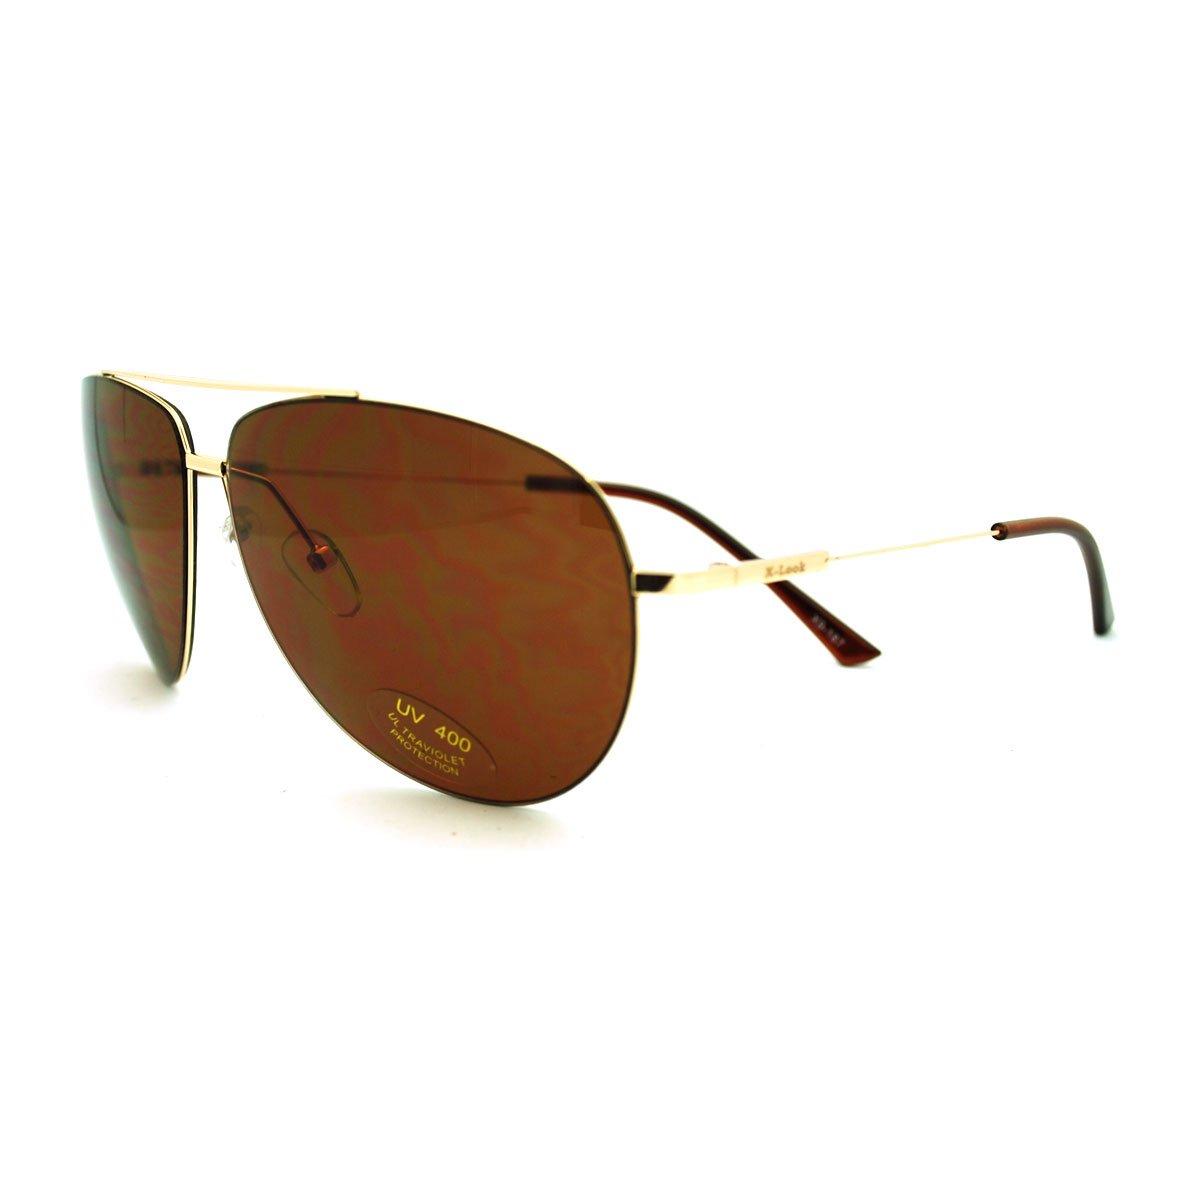 Mens Wire Rim Sniper Light Weight Pilot Sunglasses